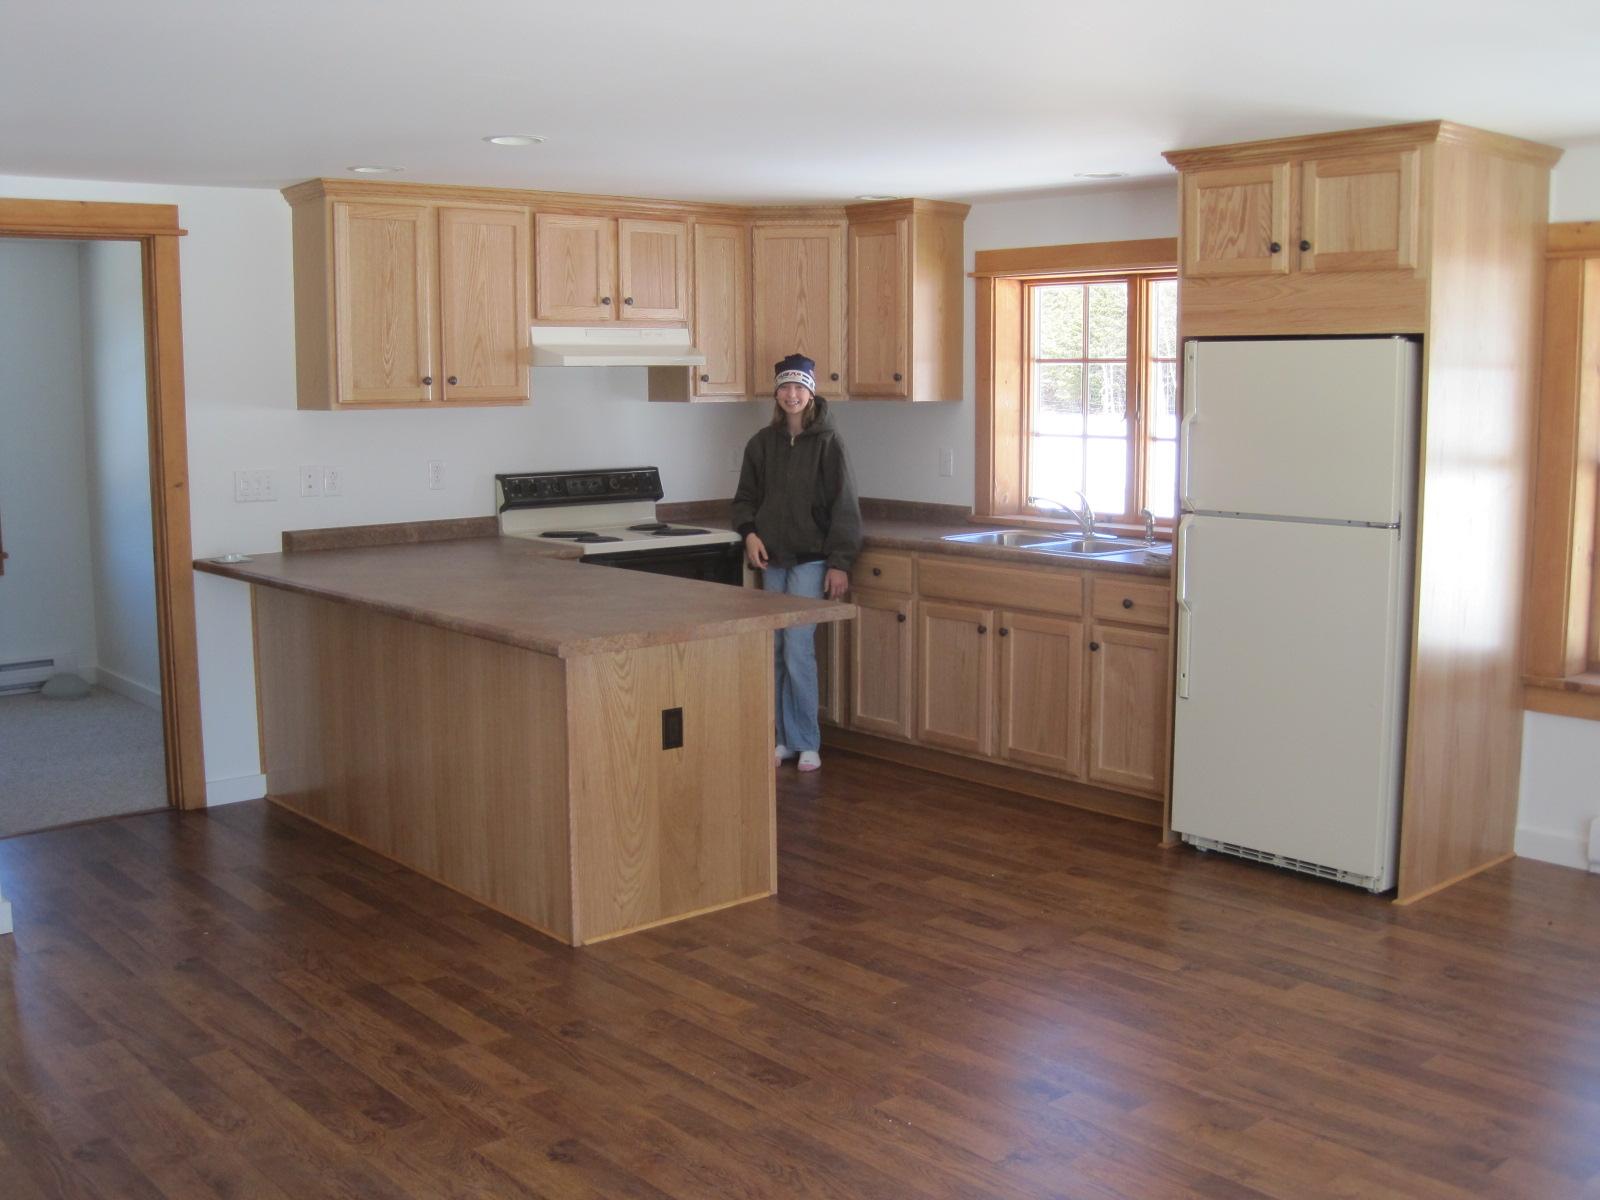 Laminate flooring lay laminate flooring australia for Bamboo kitchen cabinets australia